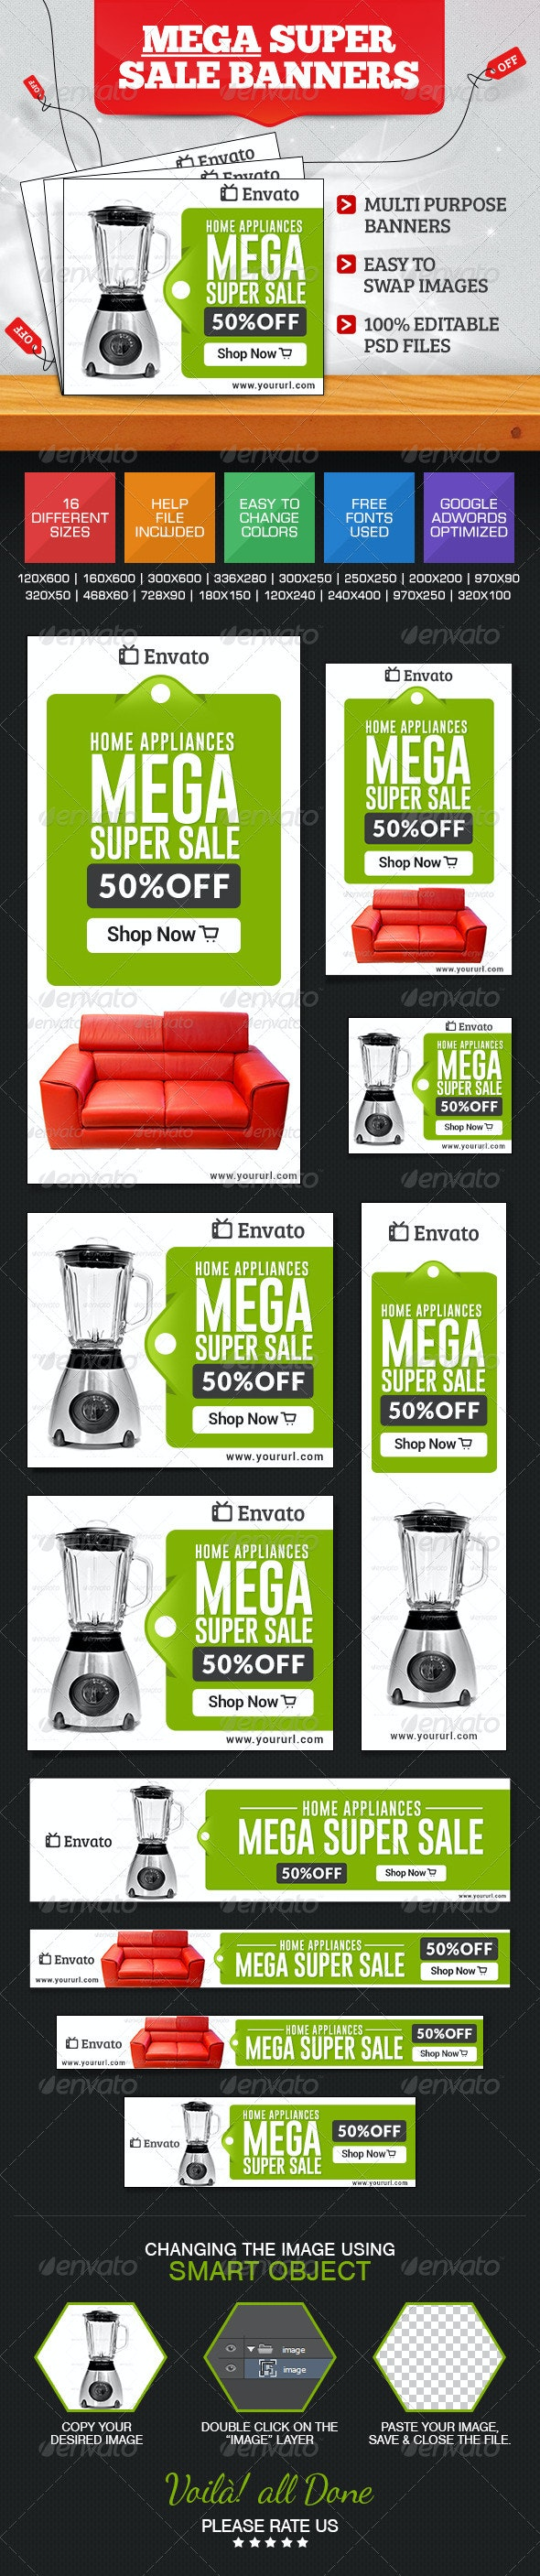 Super Sale Banner Set - Banners & Ads Web Elements